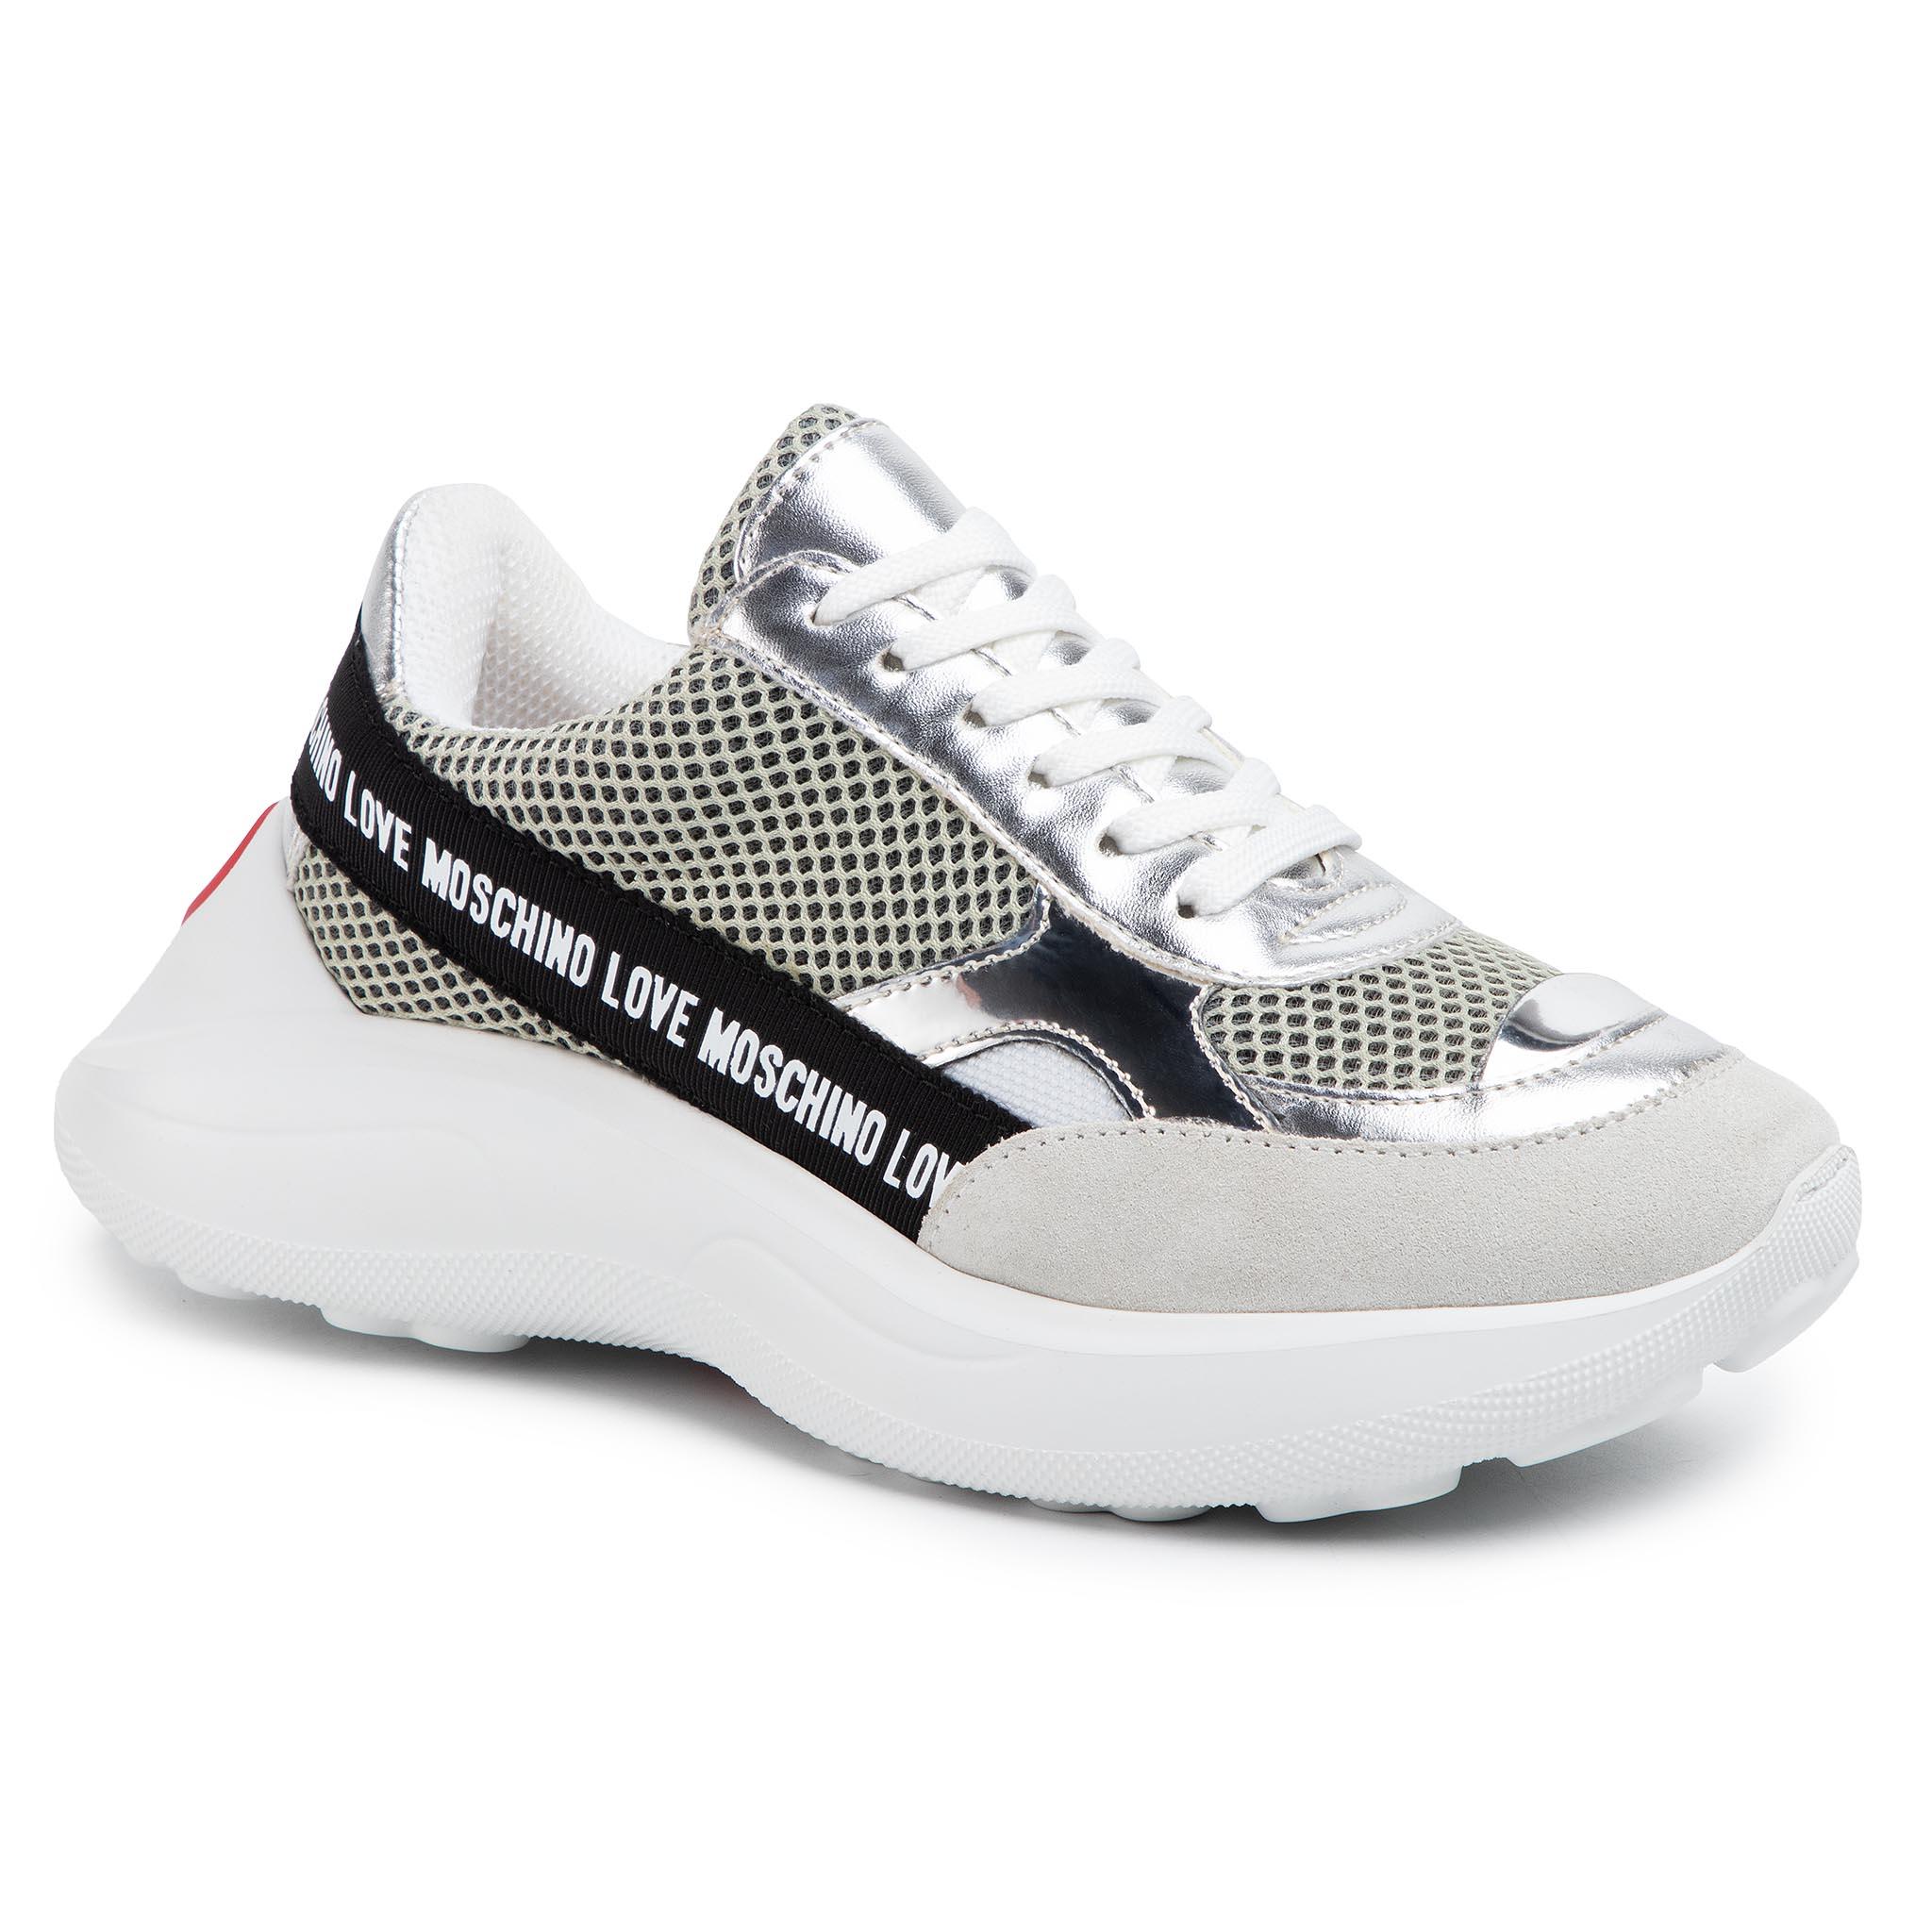 Sneakers LOVE MOSCHINO - JA15086G1AIO210A  Bia/Arge/Perla